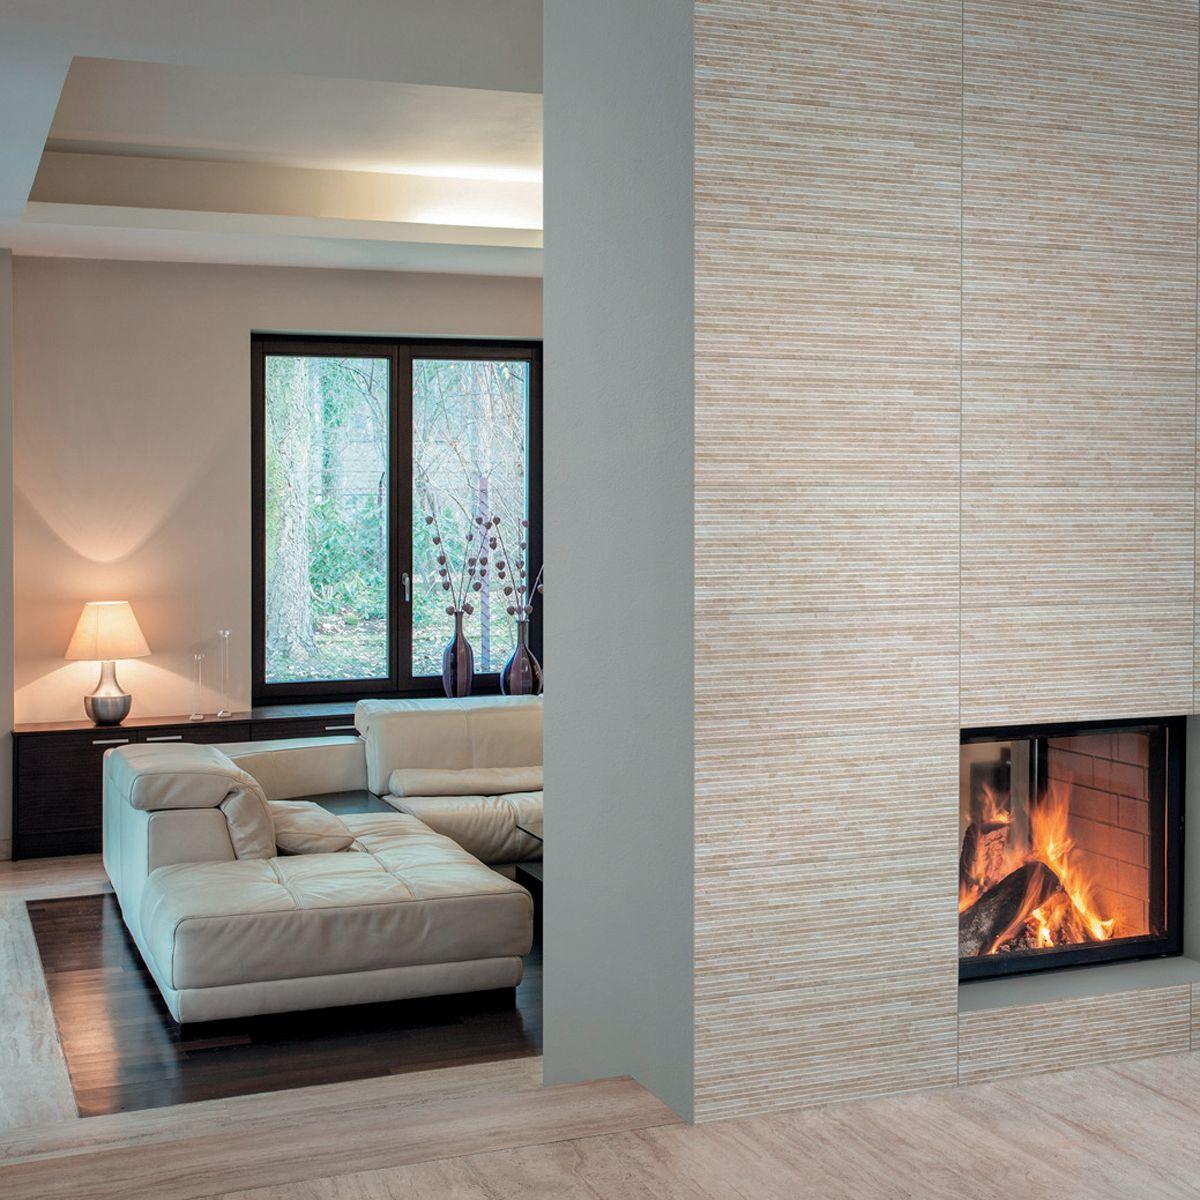 Disegni decorativi per pareti kt with disegni decorativi - Pannelli decorativi prezzi ...